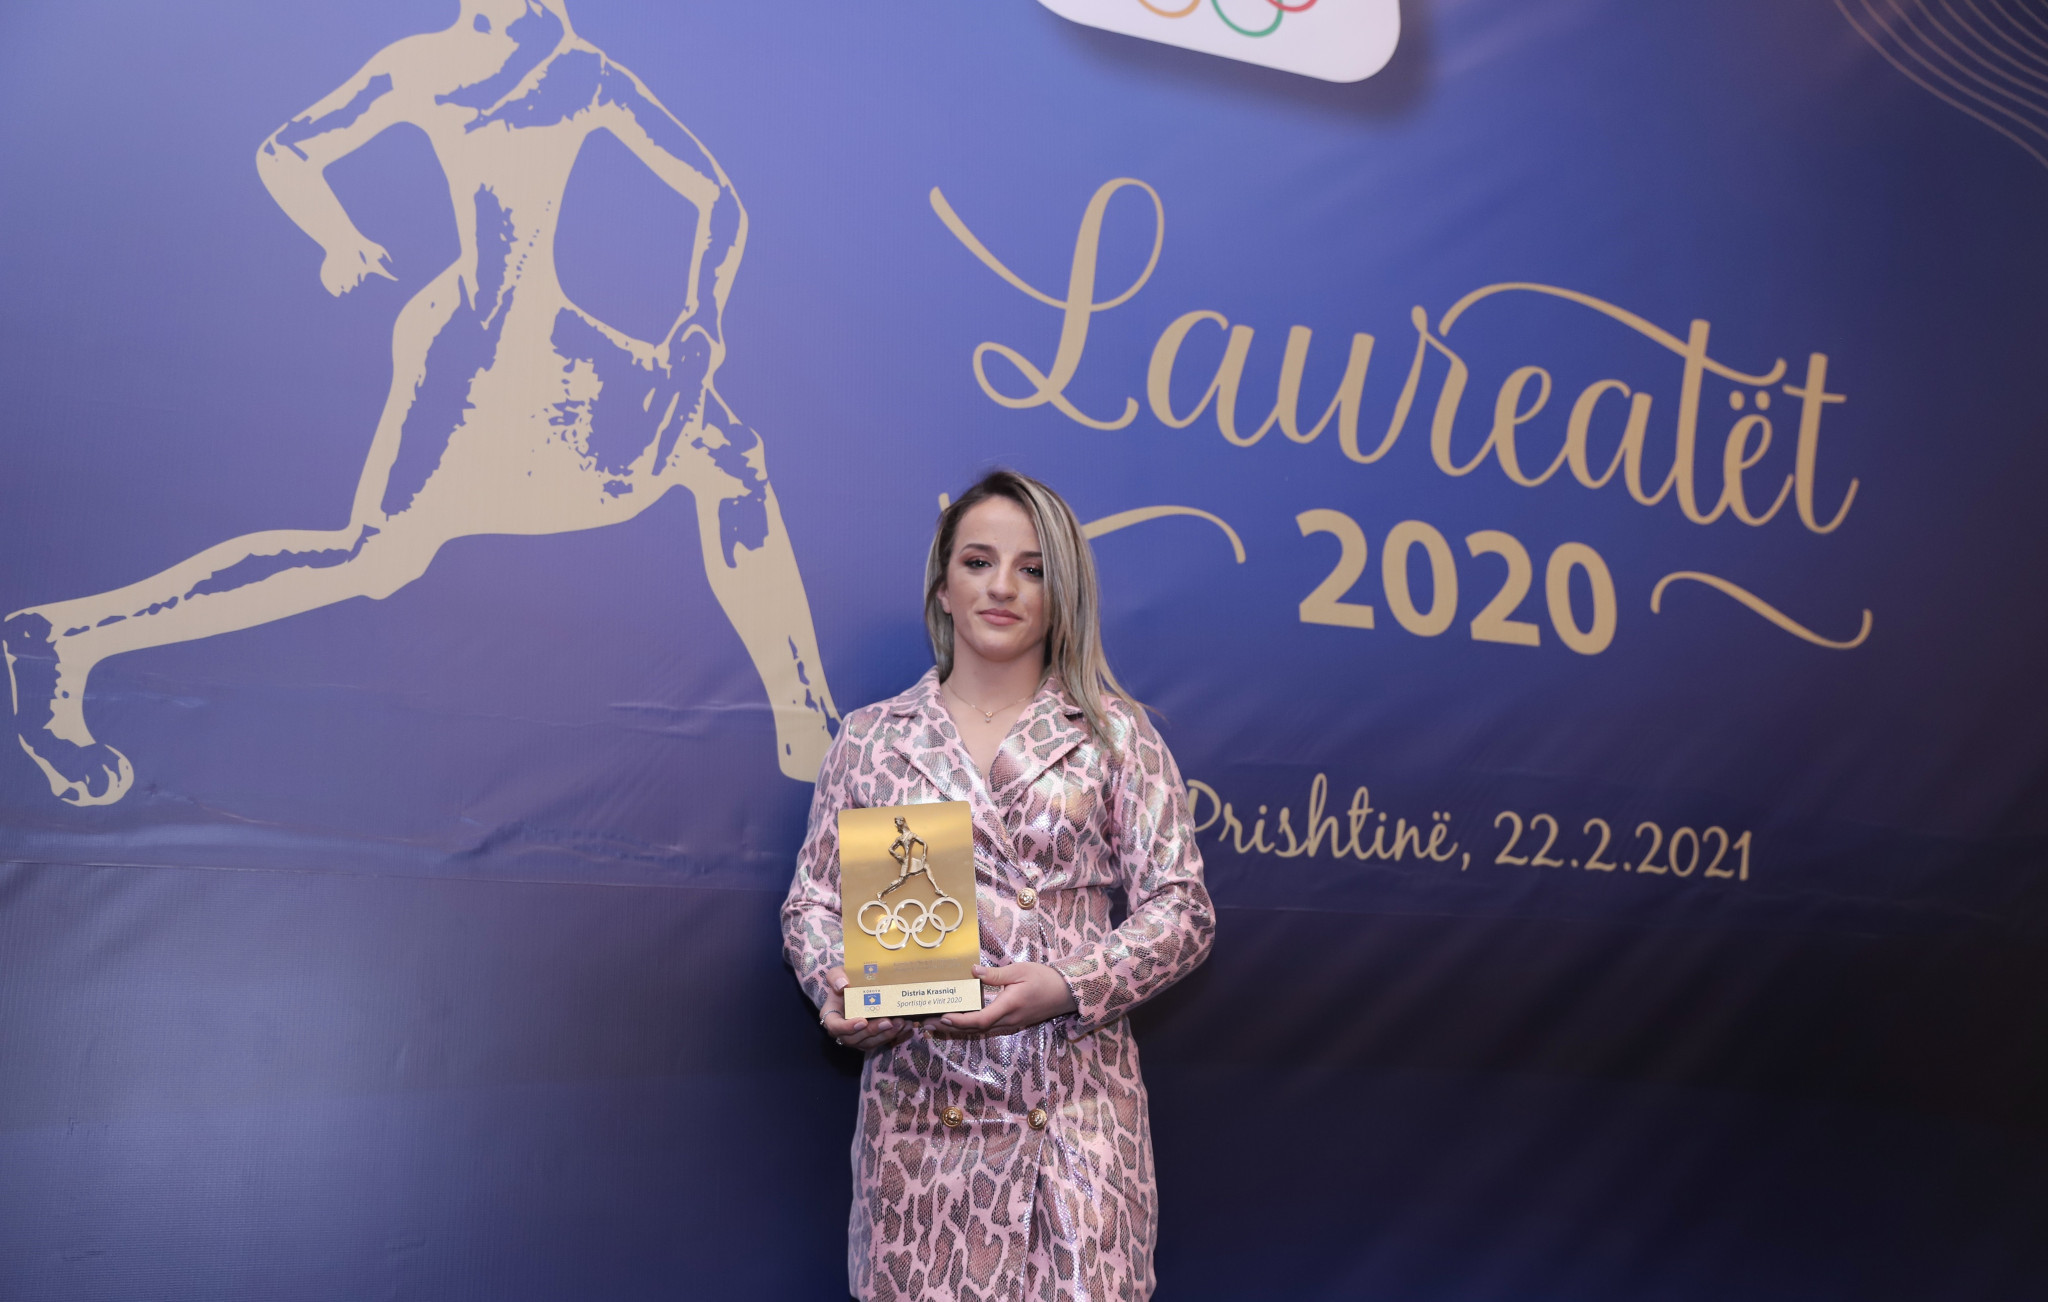 Judská hviezda Destria Krasnicki vyhrala športovkyňu roka © KOC